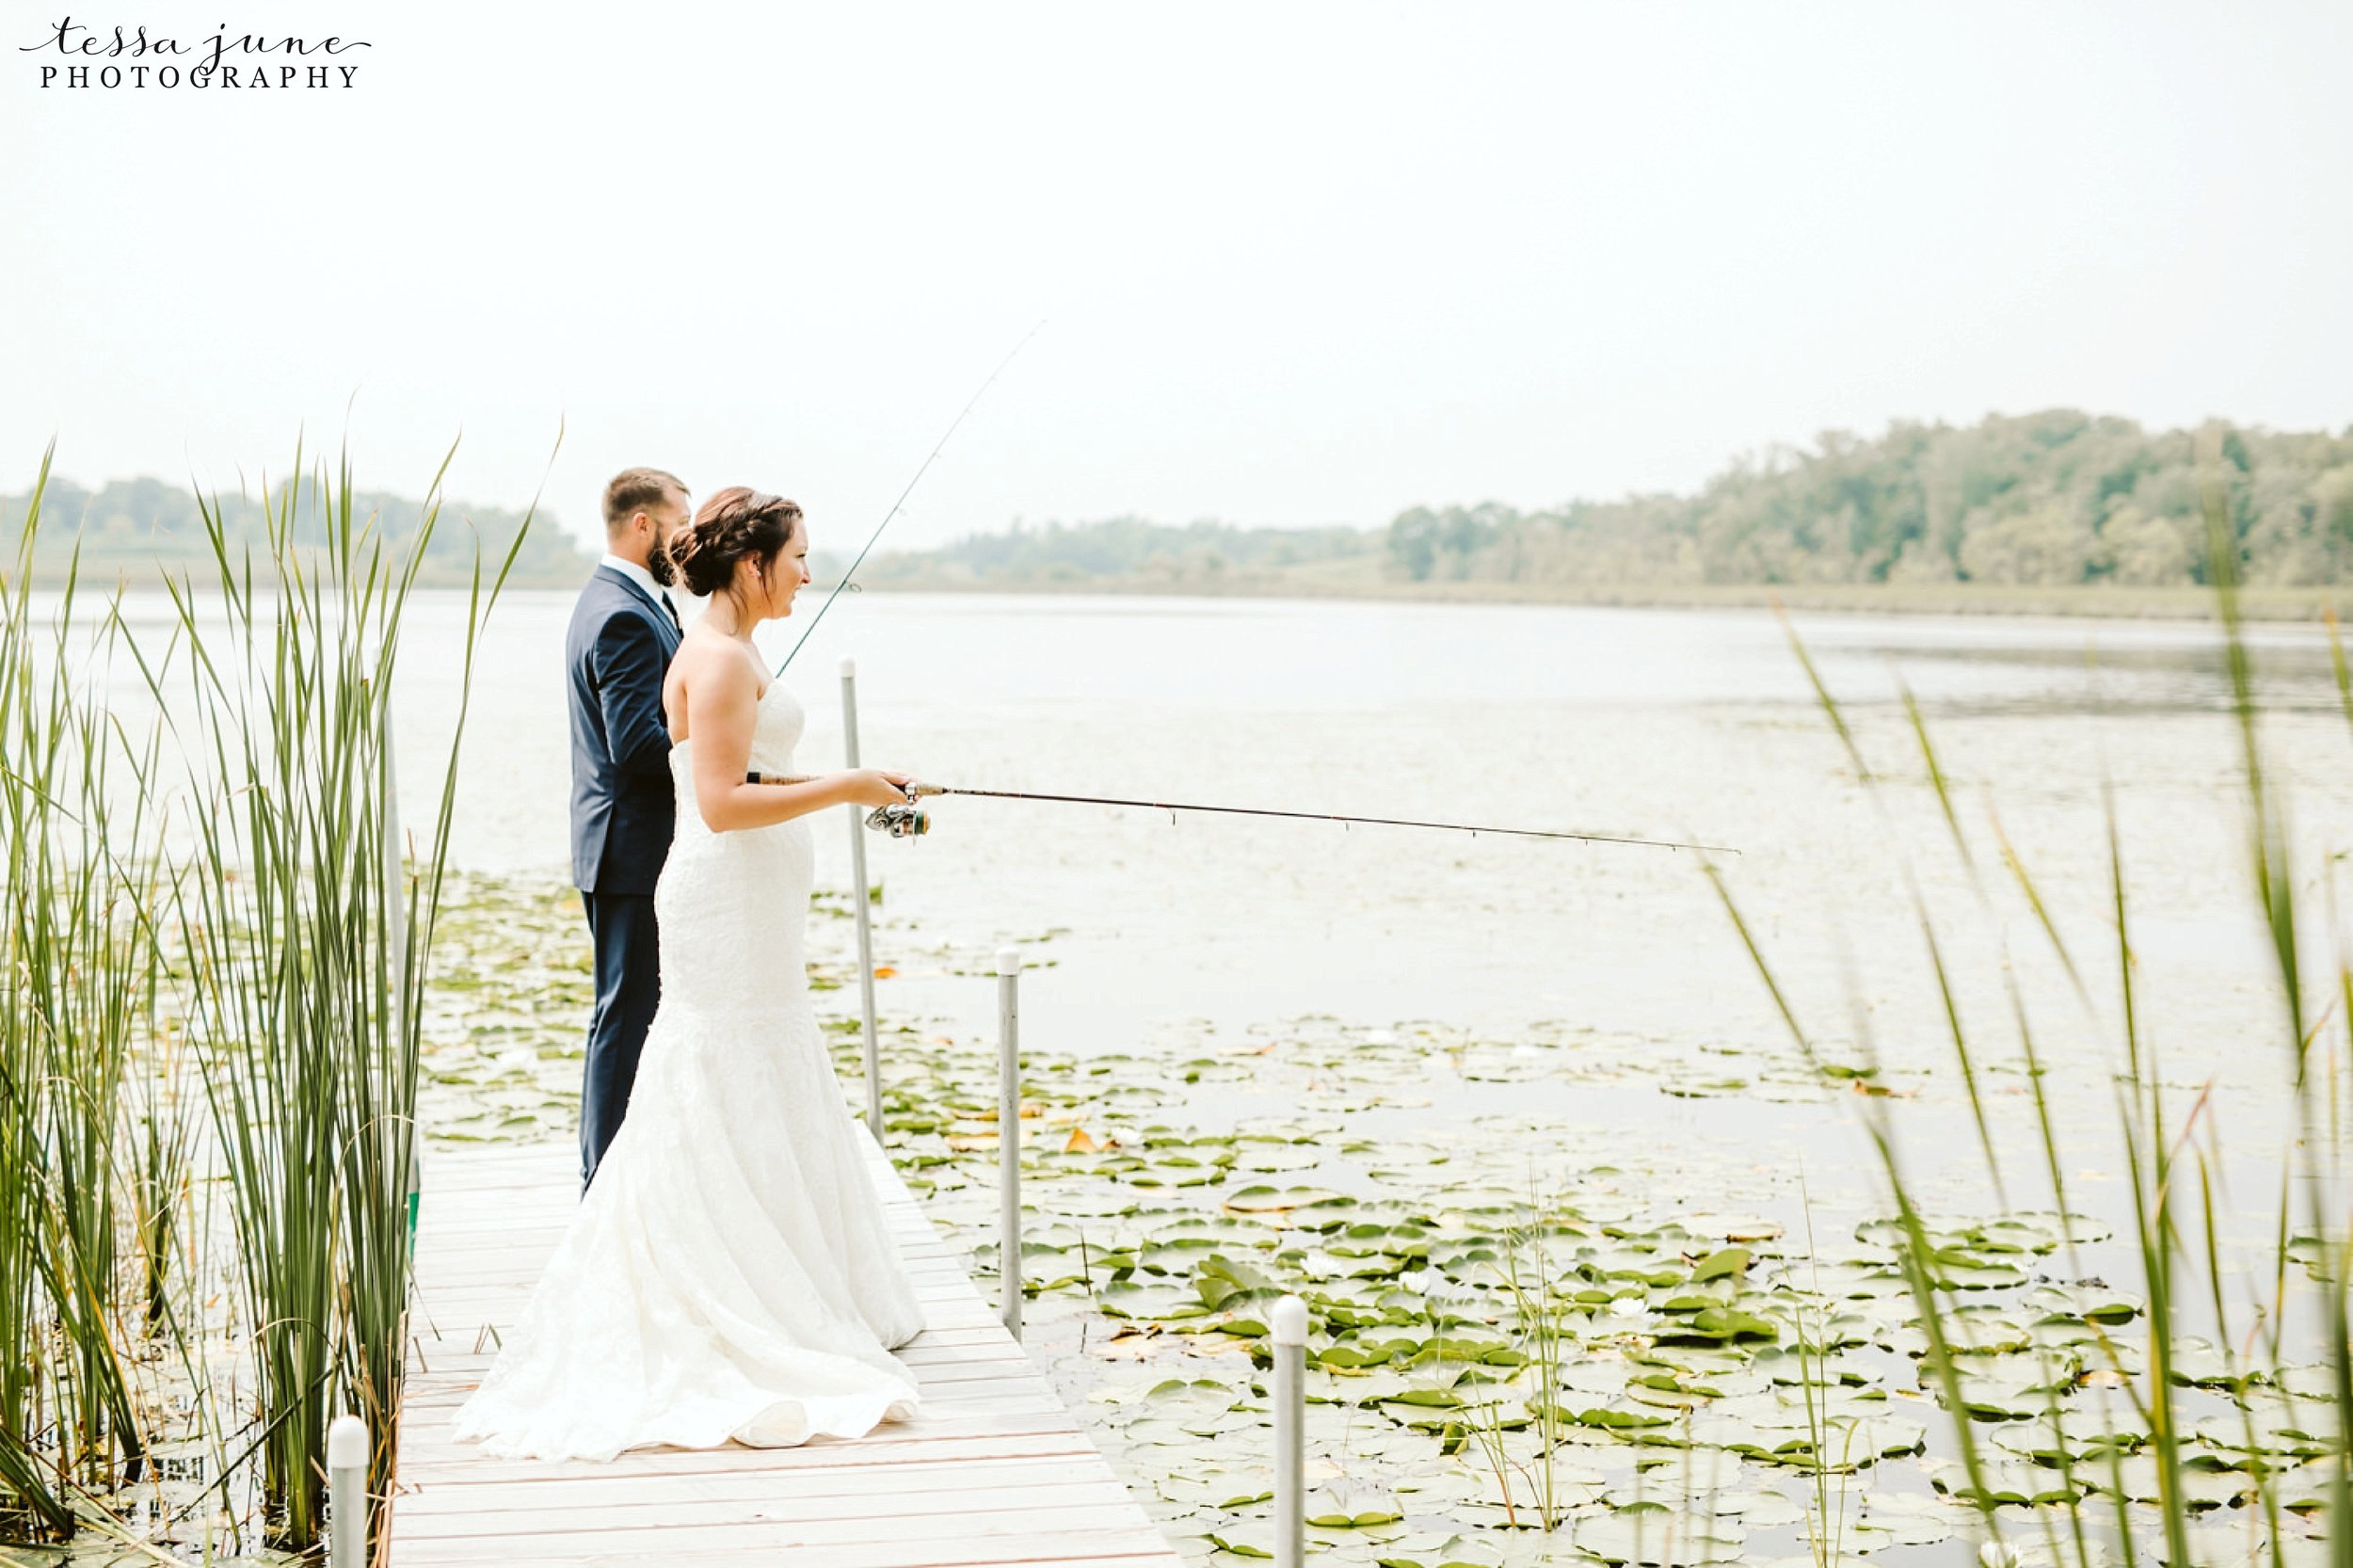 gathered-oaks-barn-wedding-alexandria-minnesota-49.jpg